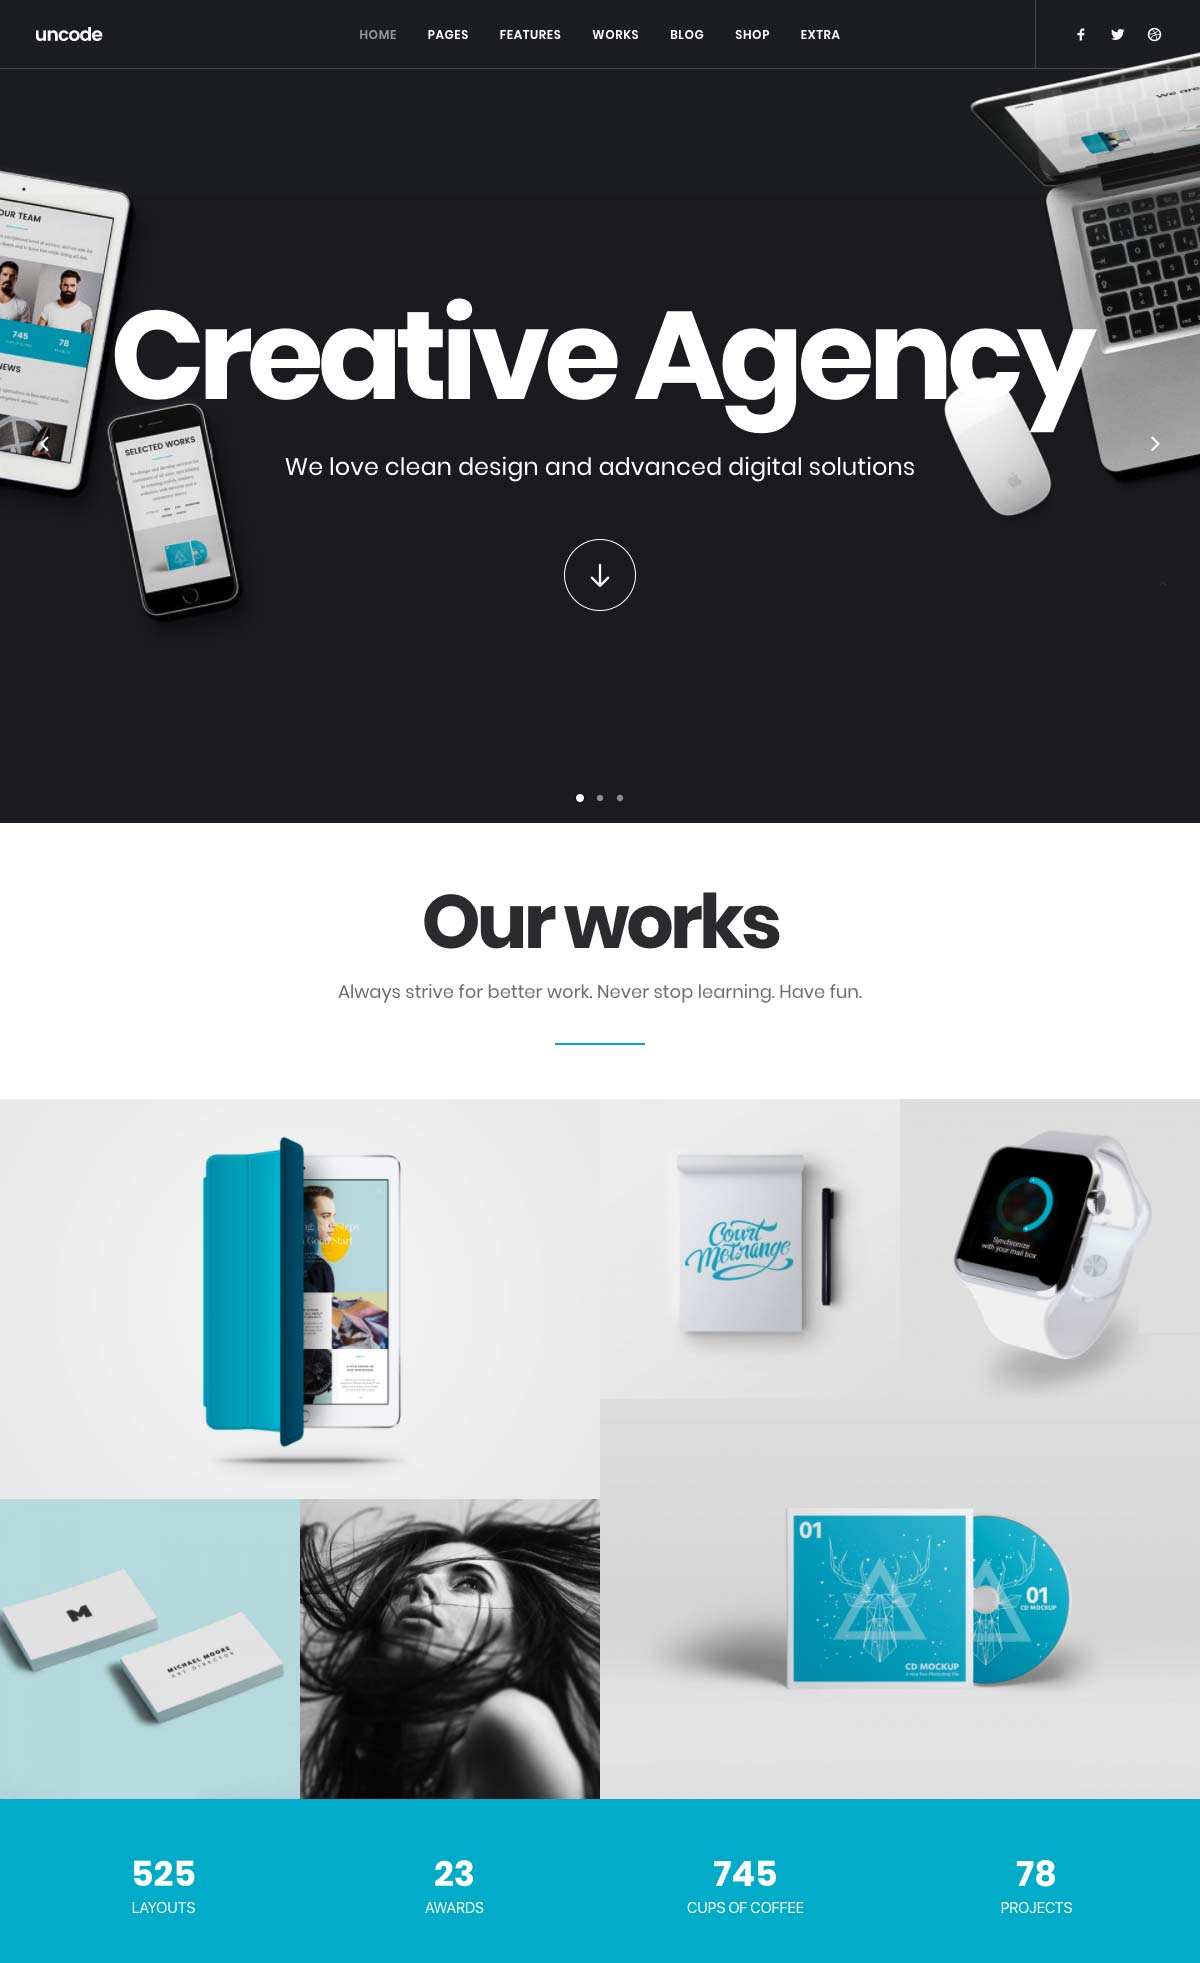 Wordpress Template Landing Page Creative Agency